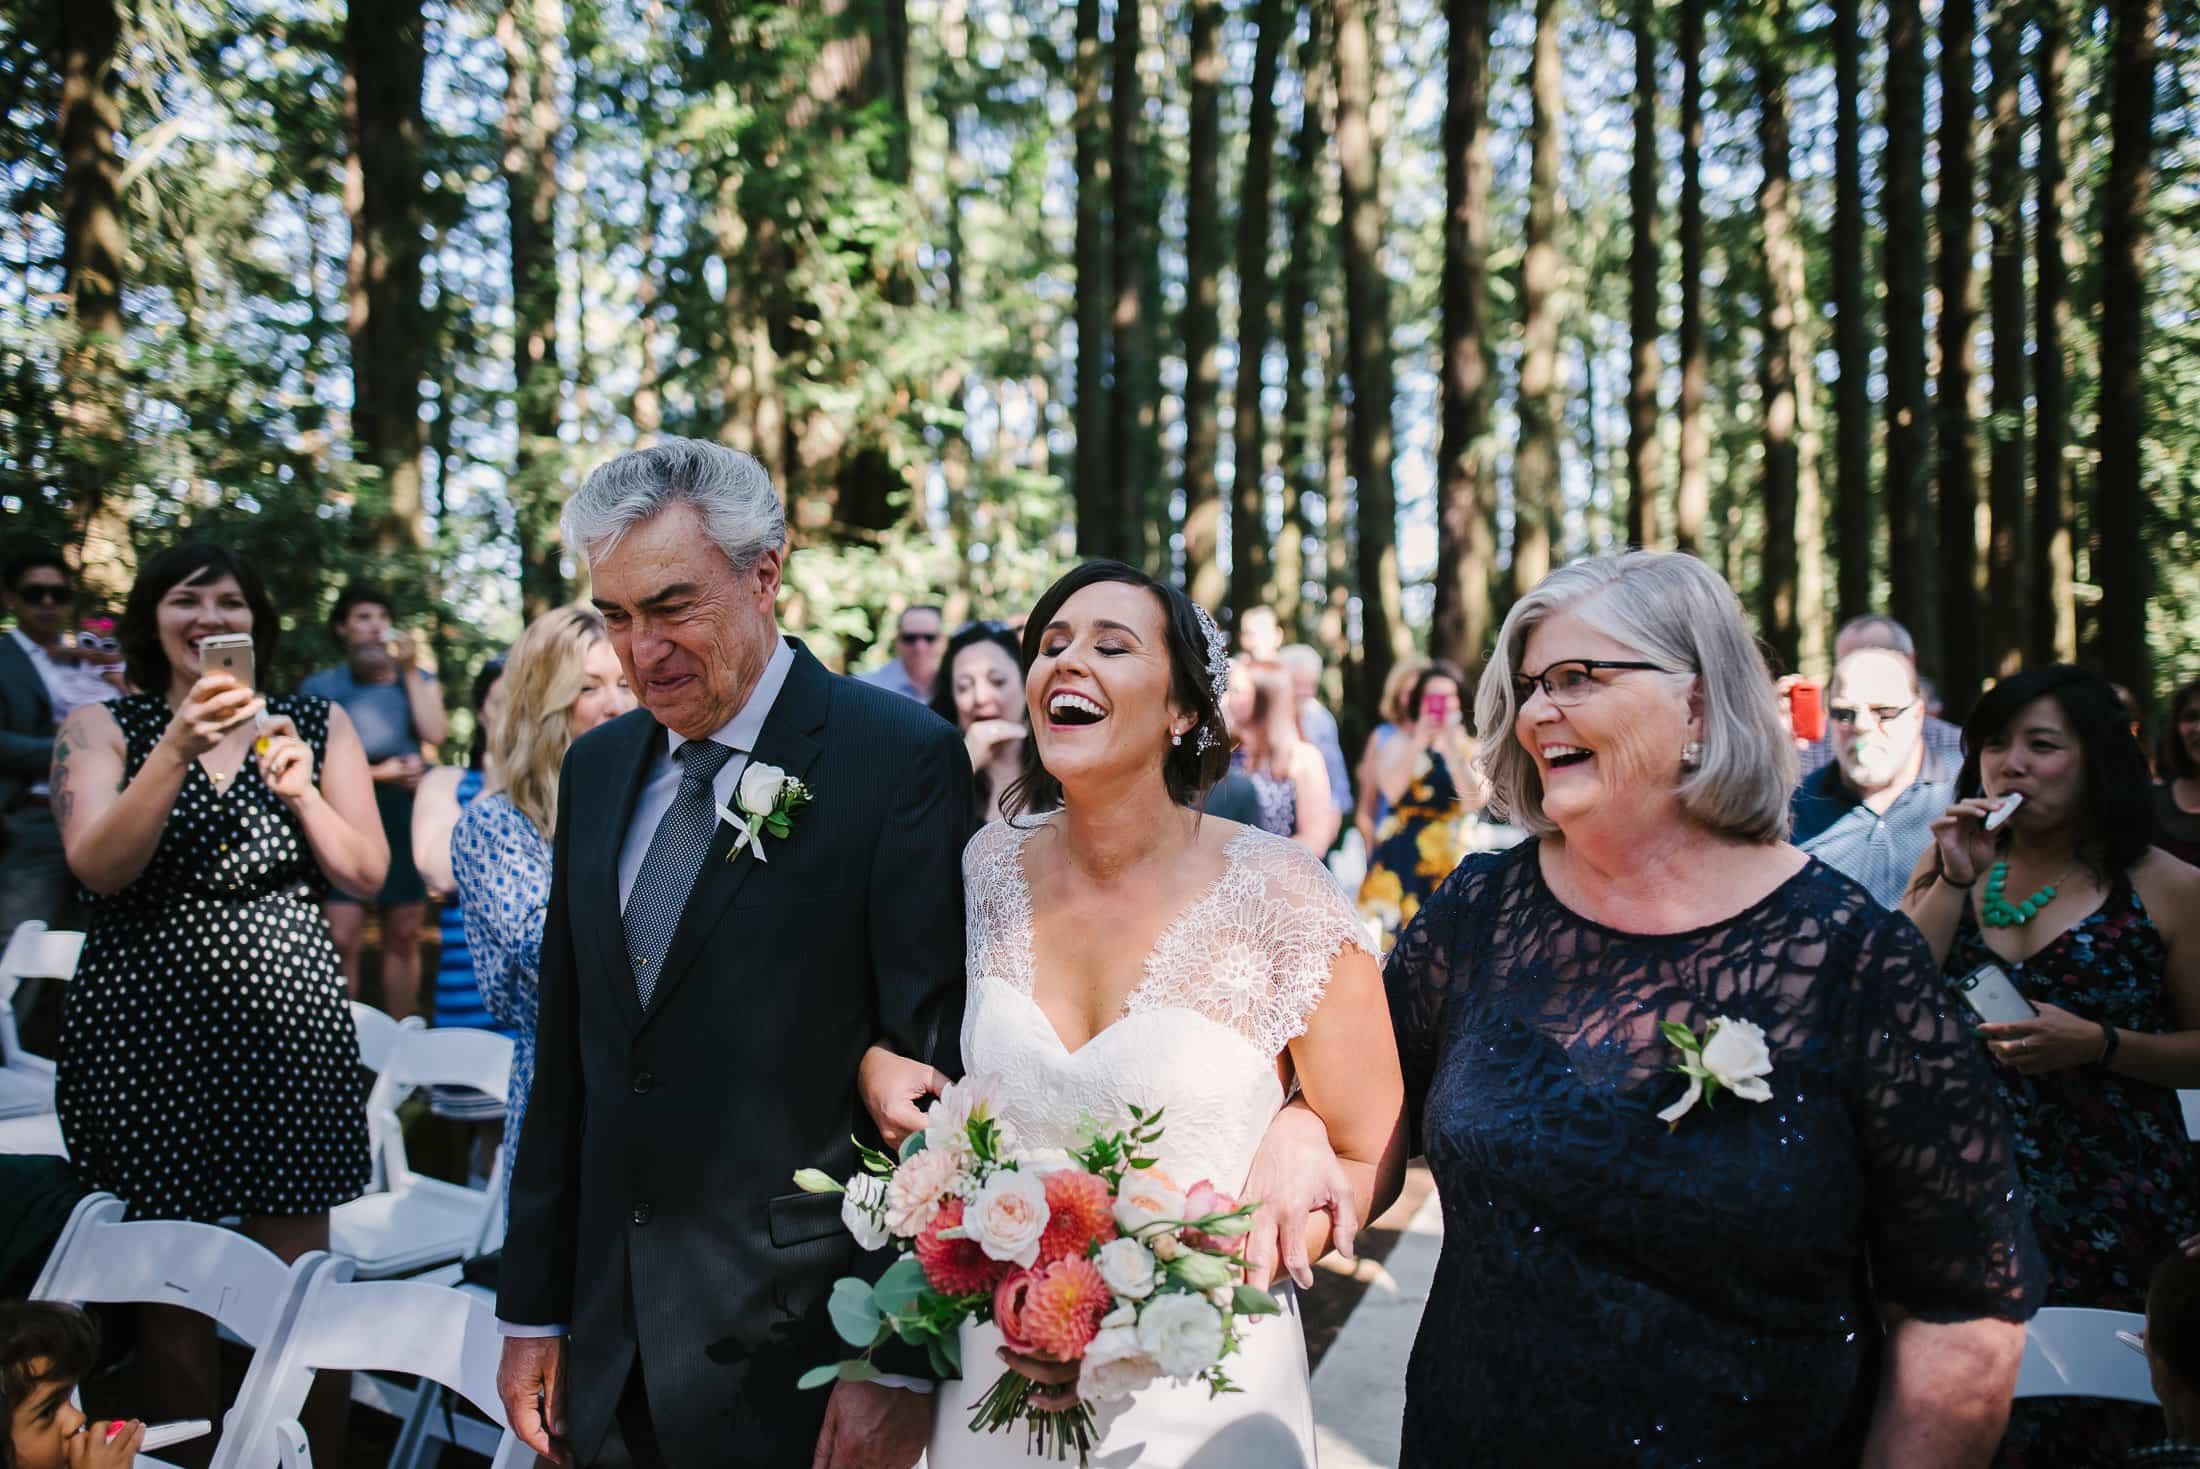 Robert's Regional Park Wedding